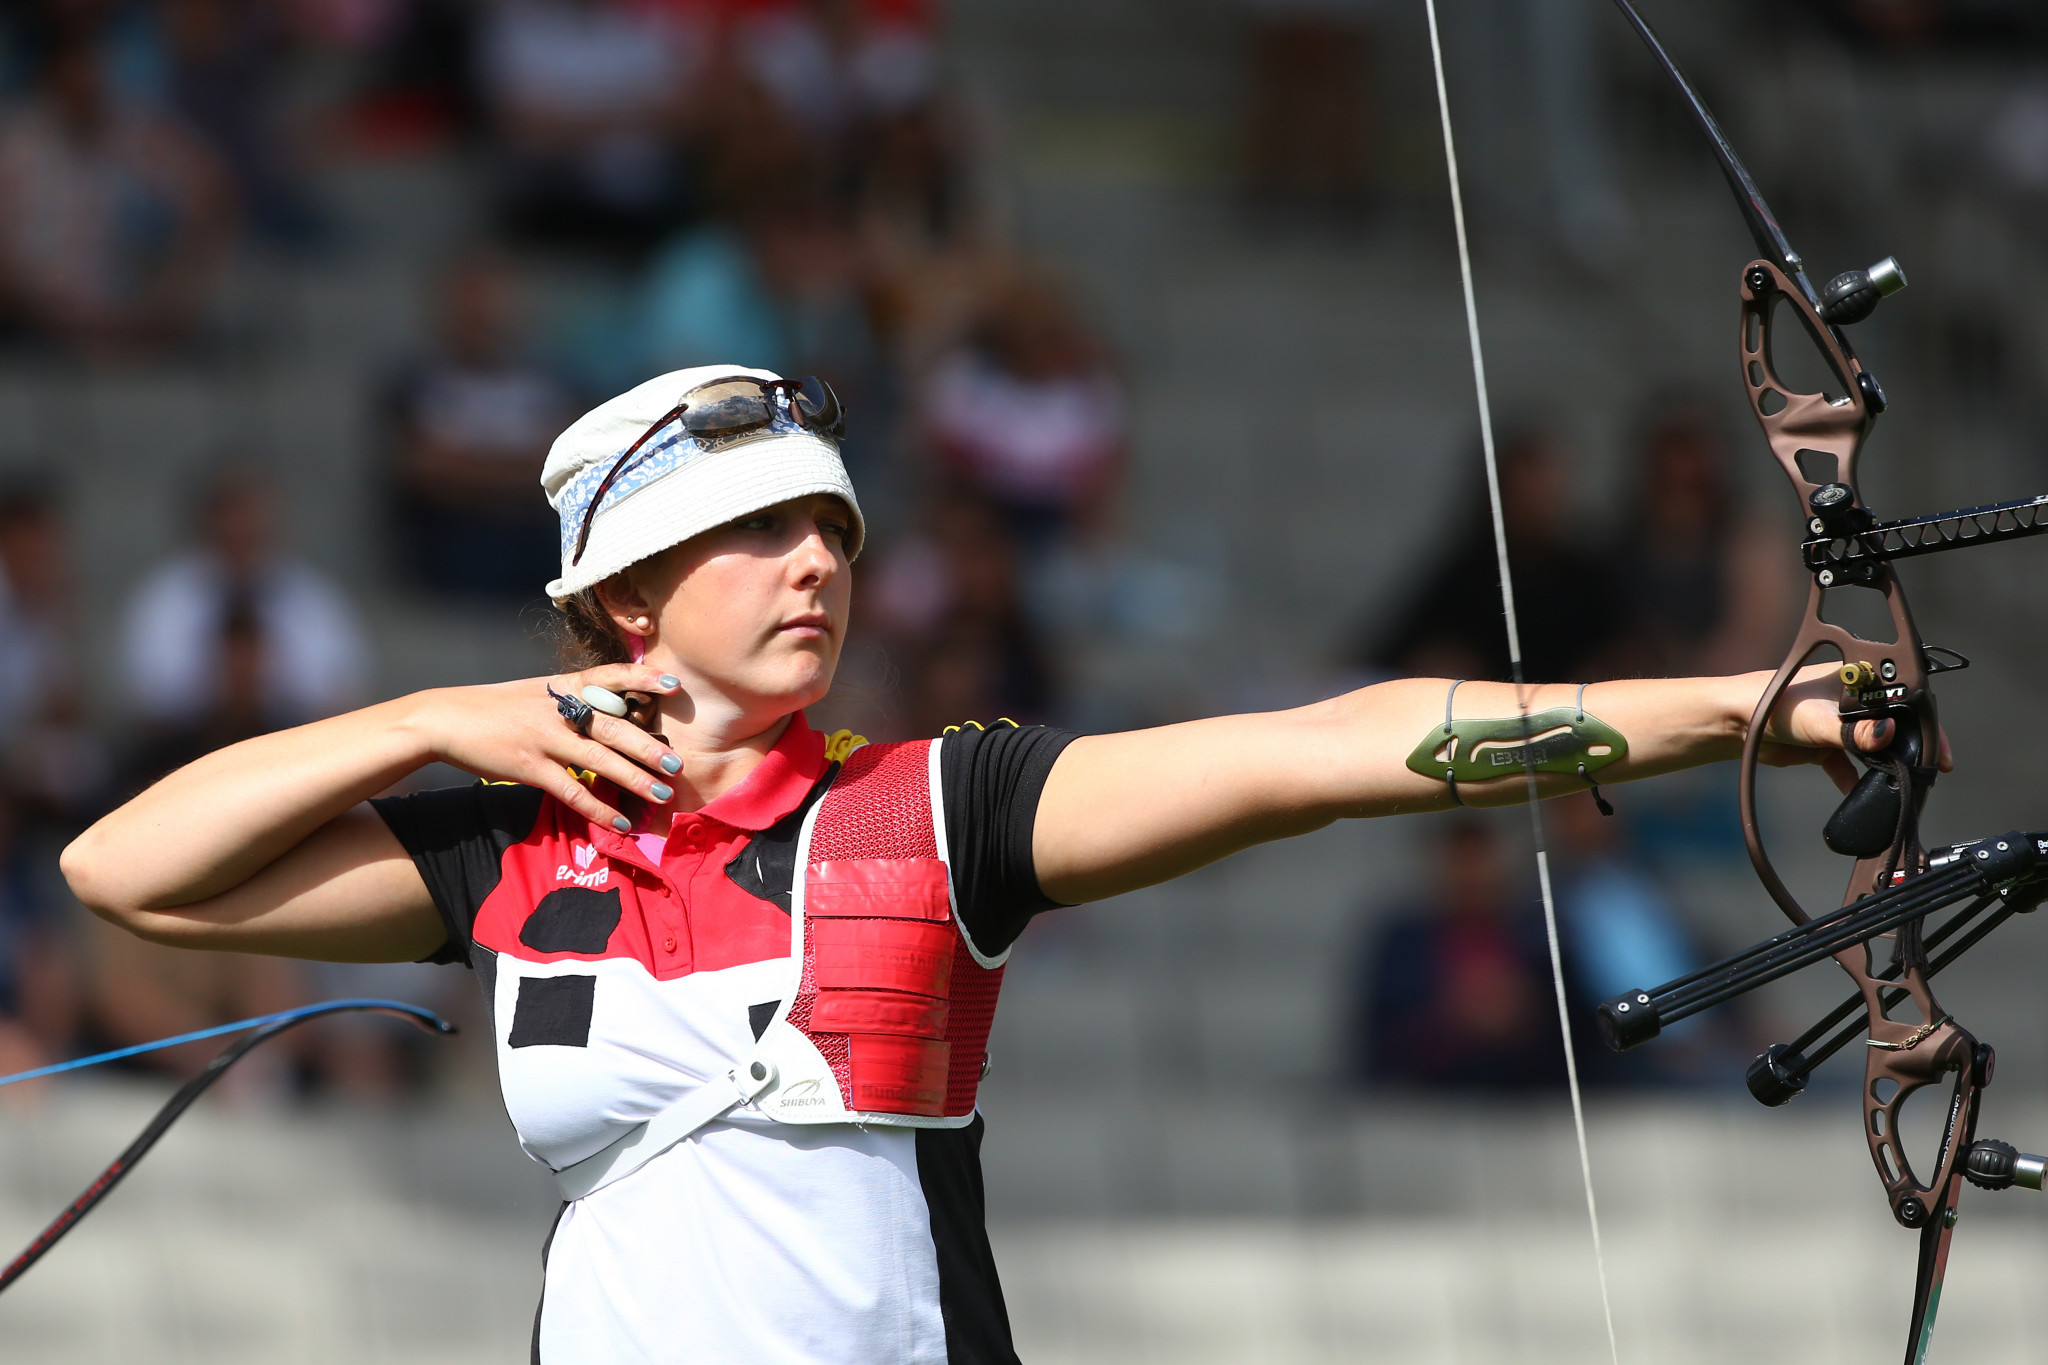 German archer Richter to miss Tokyo 2020 after shock retirement